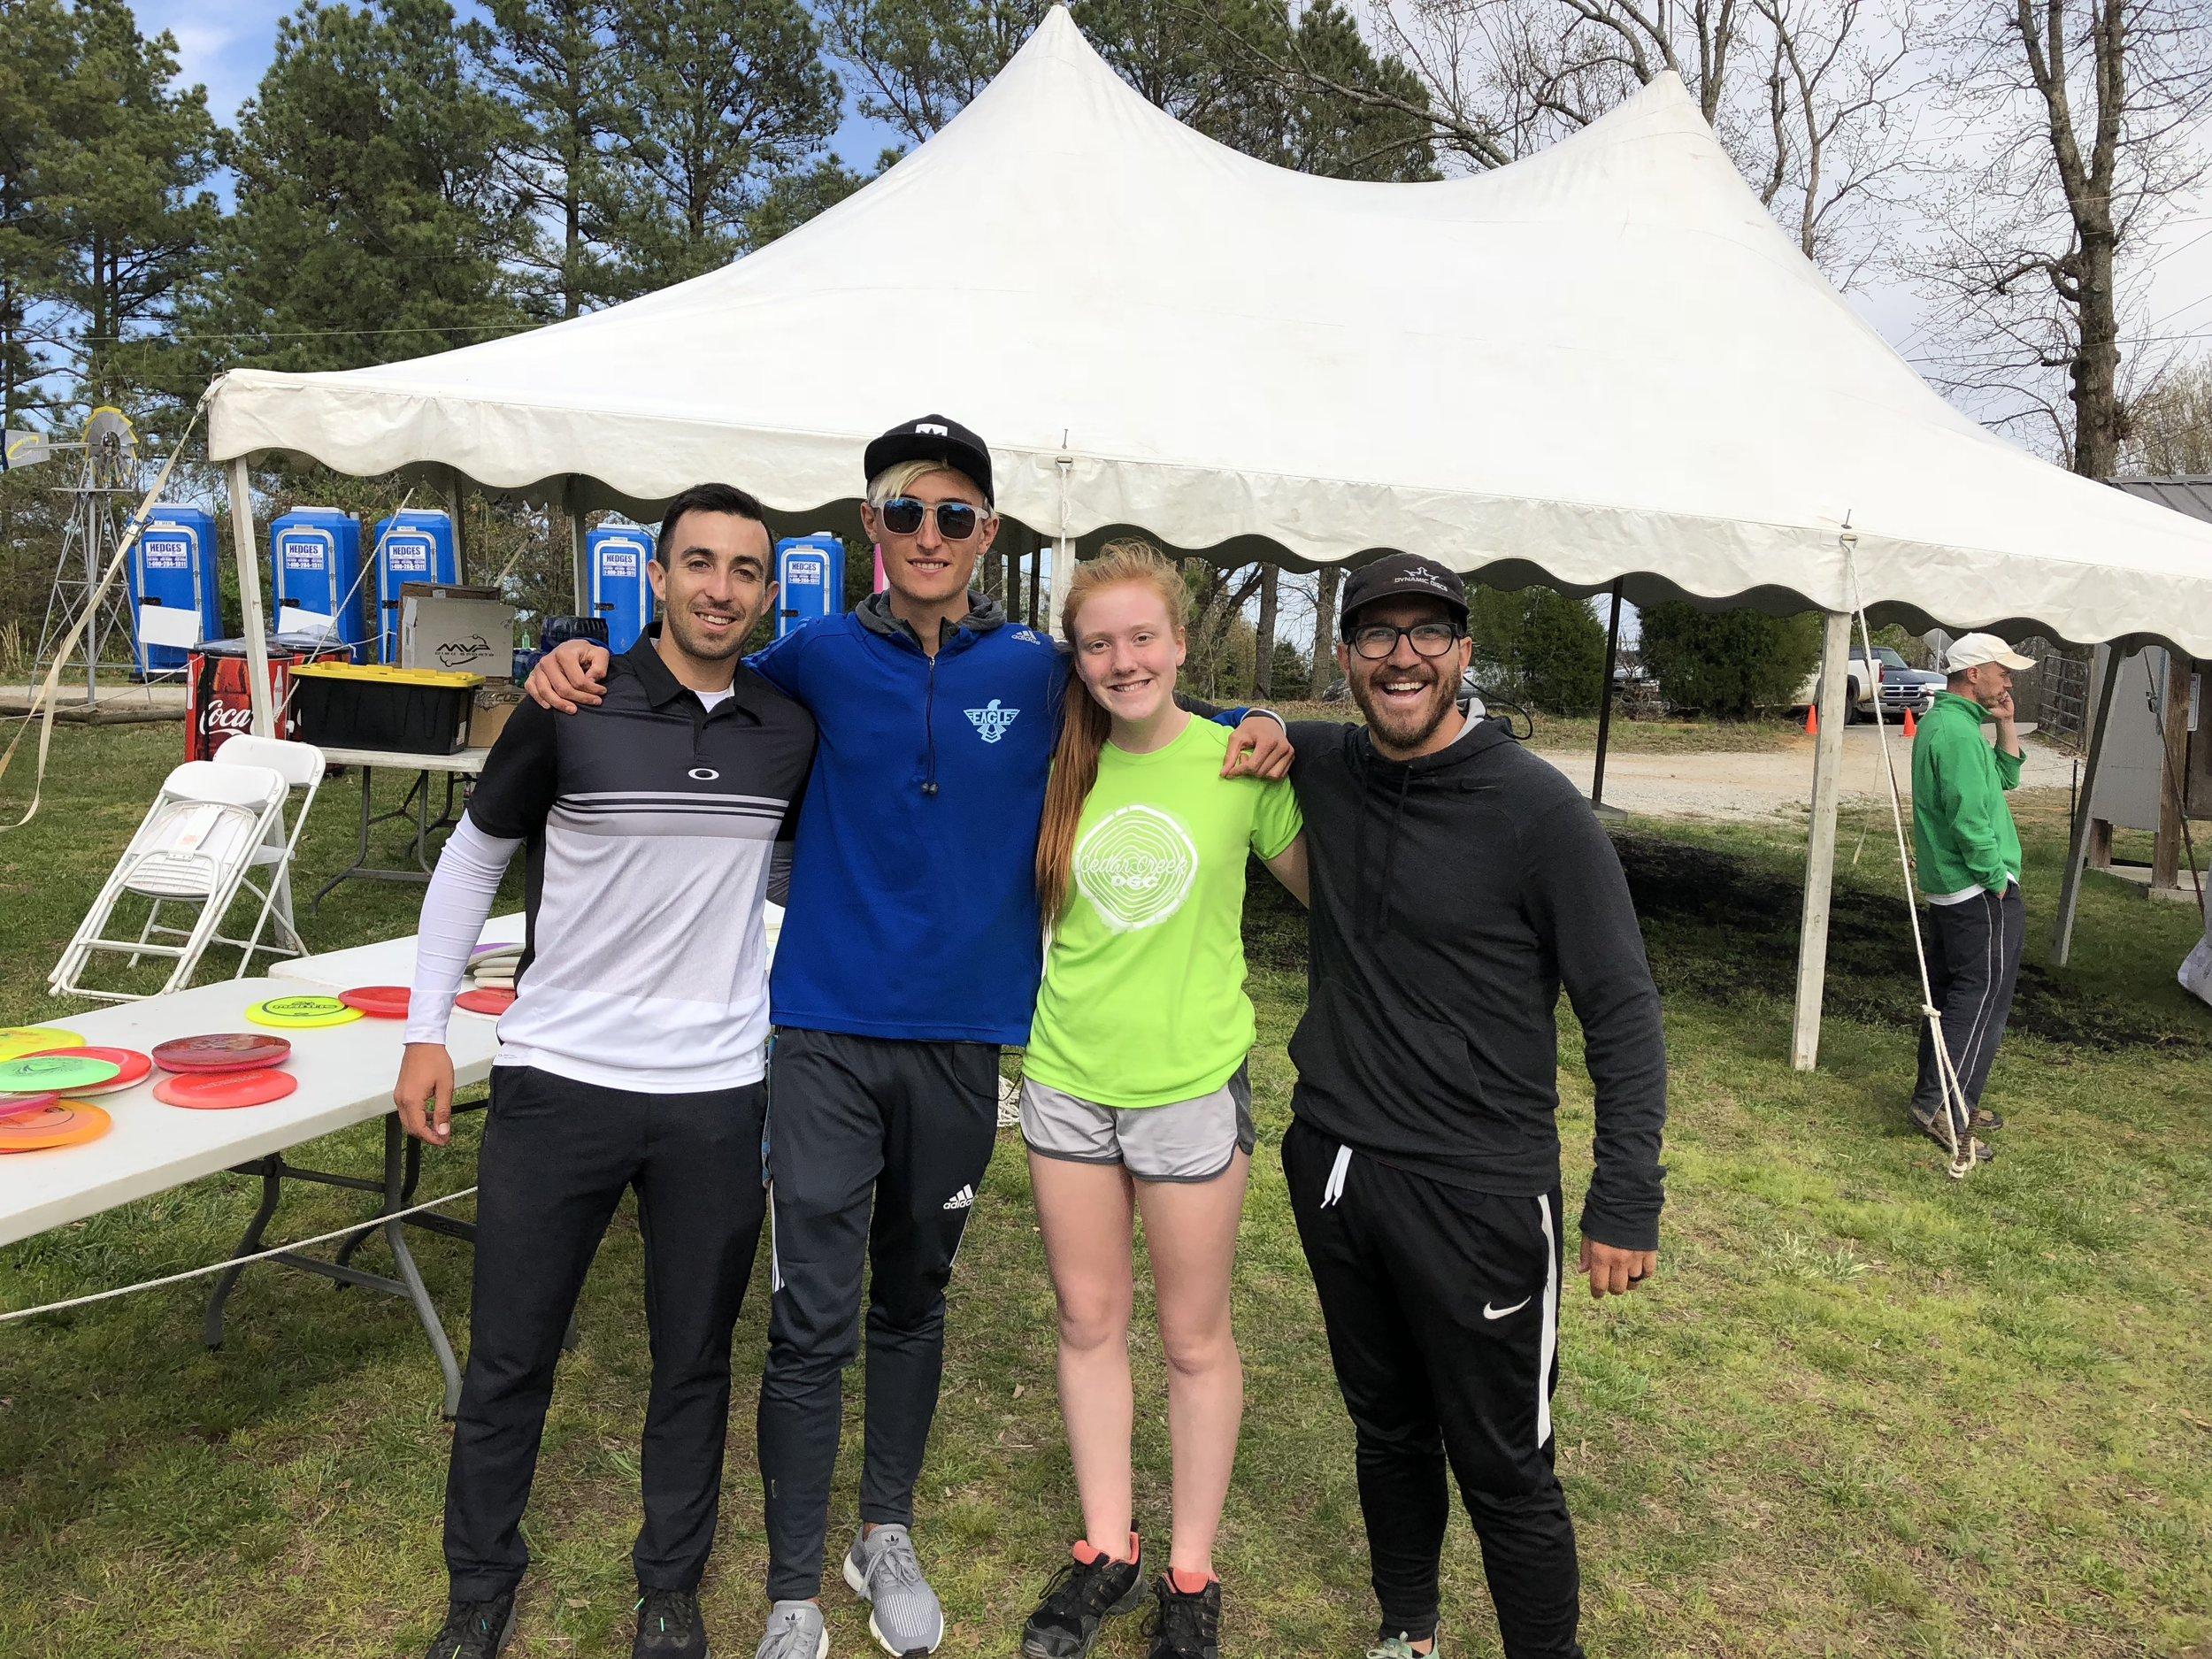 Paul McBeth, Eagle McMahon, Me, and Eric Oakley practicing before the Jonesboro Open 2018